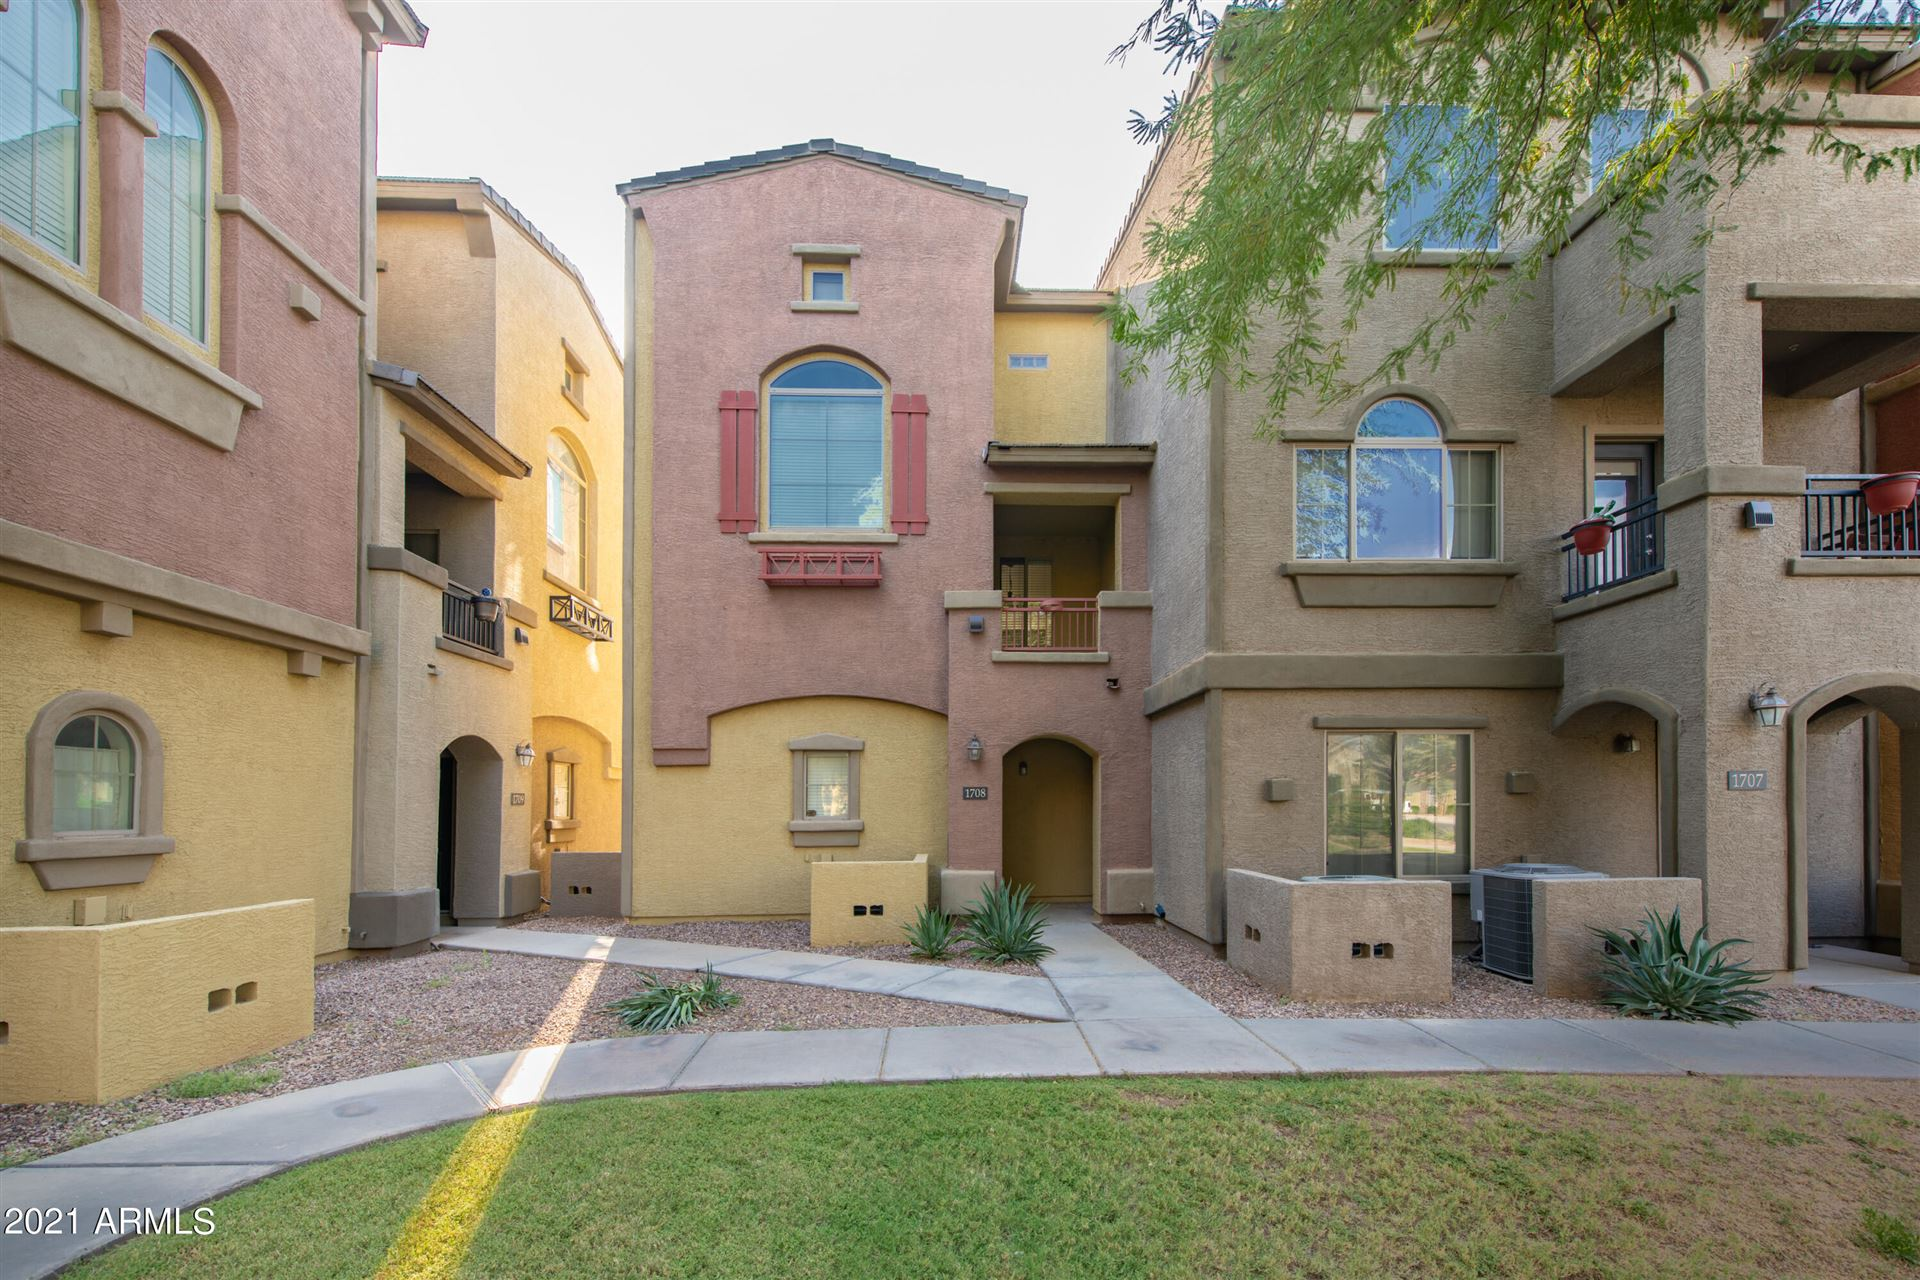 Photo of 2402 E 5th Street #1708, Tempe, AZ 85281 (MLS # 6295591)